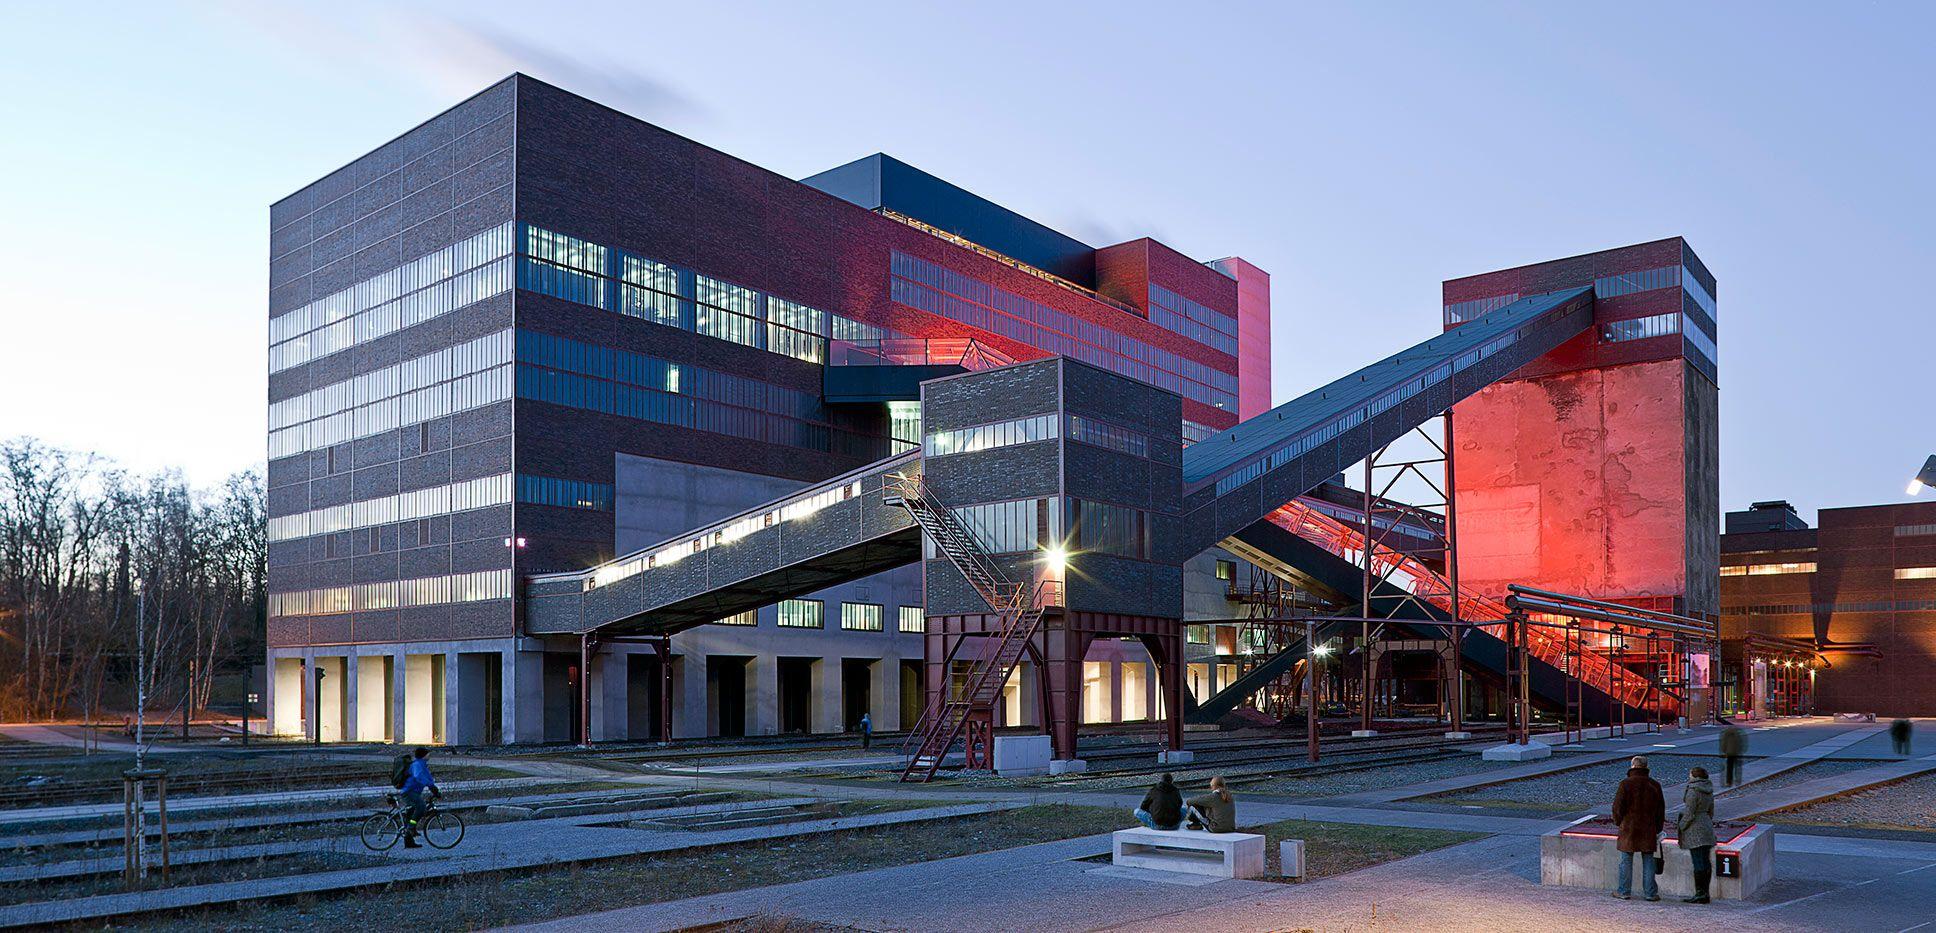 Architektur Köln pin grzegorzstiasny auf arch fotograf köln